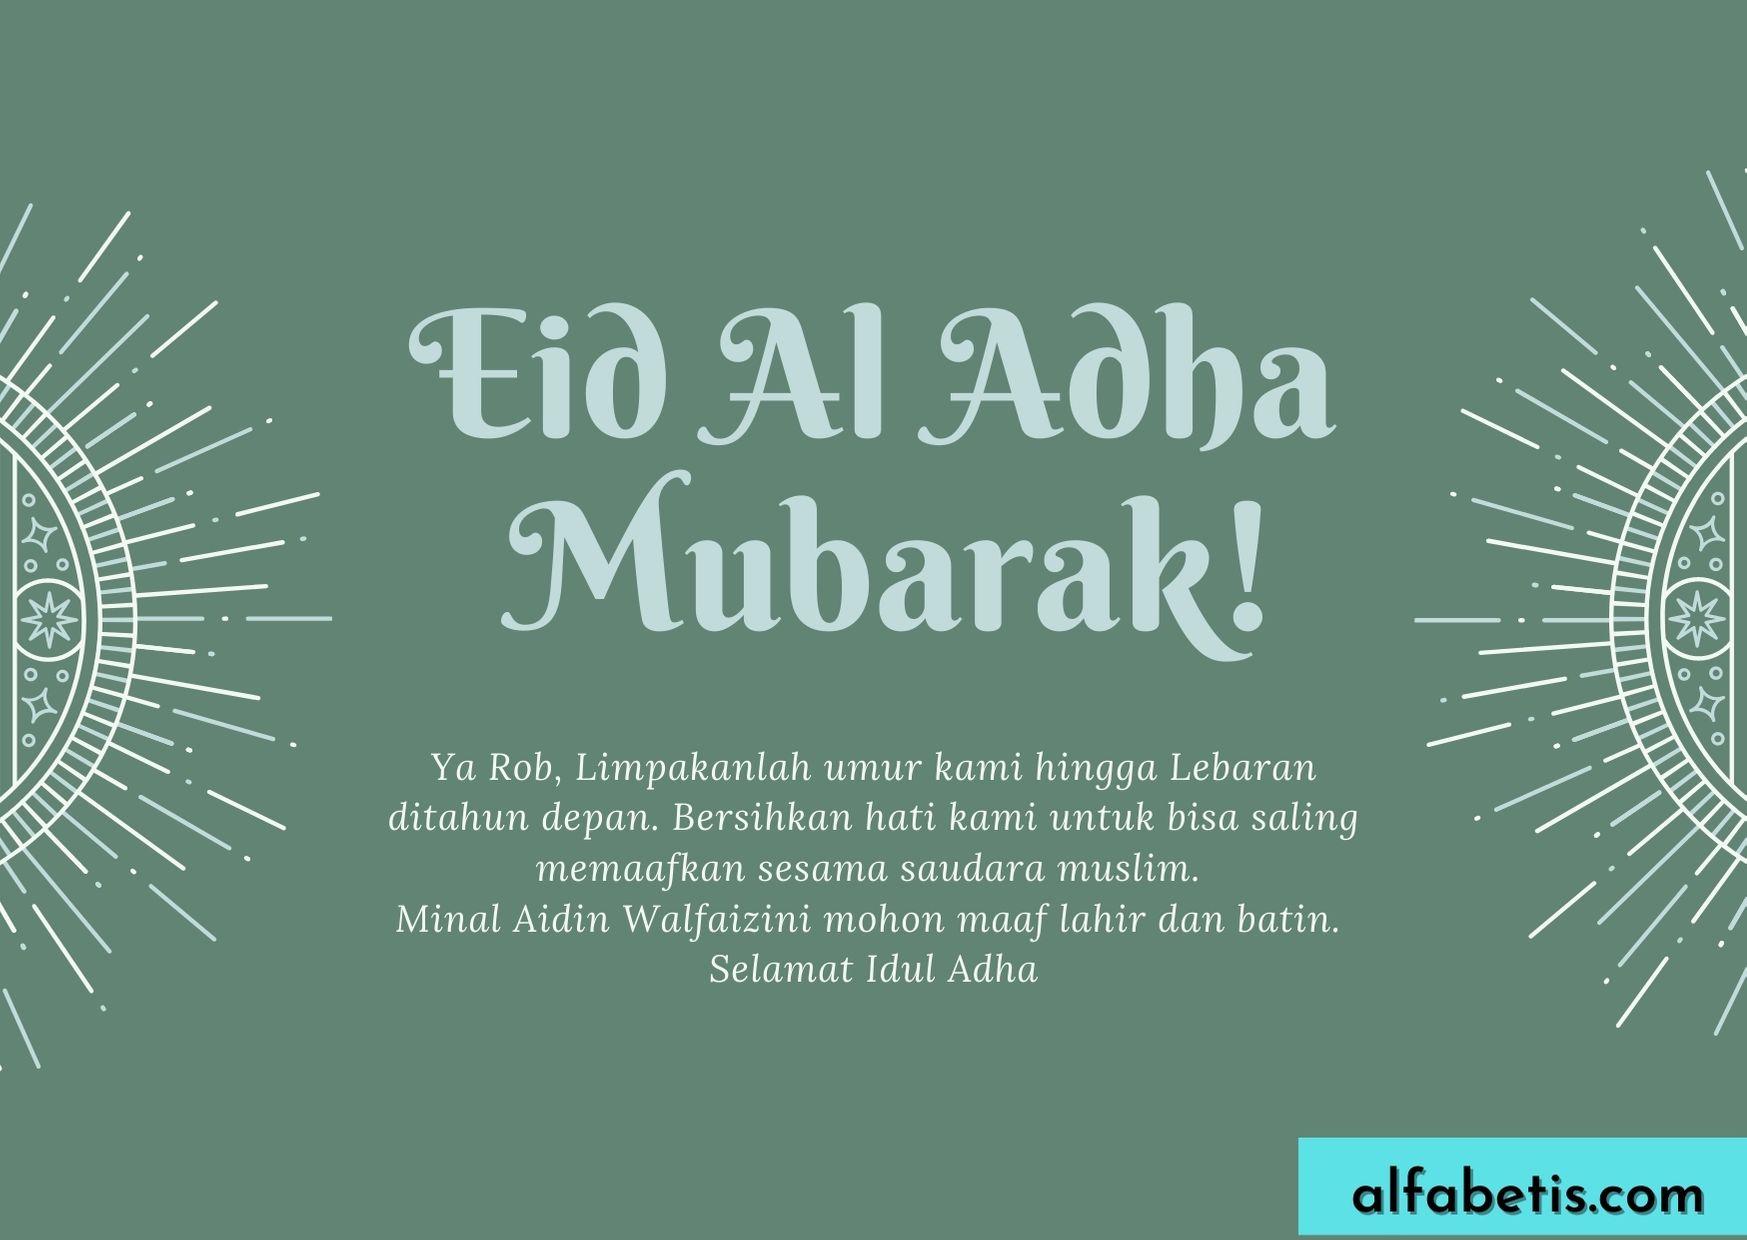 Kalimat Ucapan Selamat Hari Idul Adha 1442H